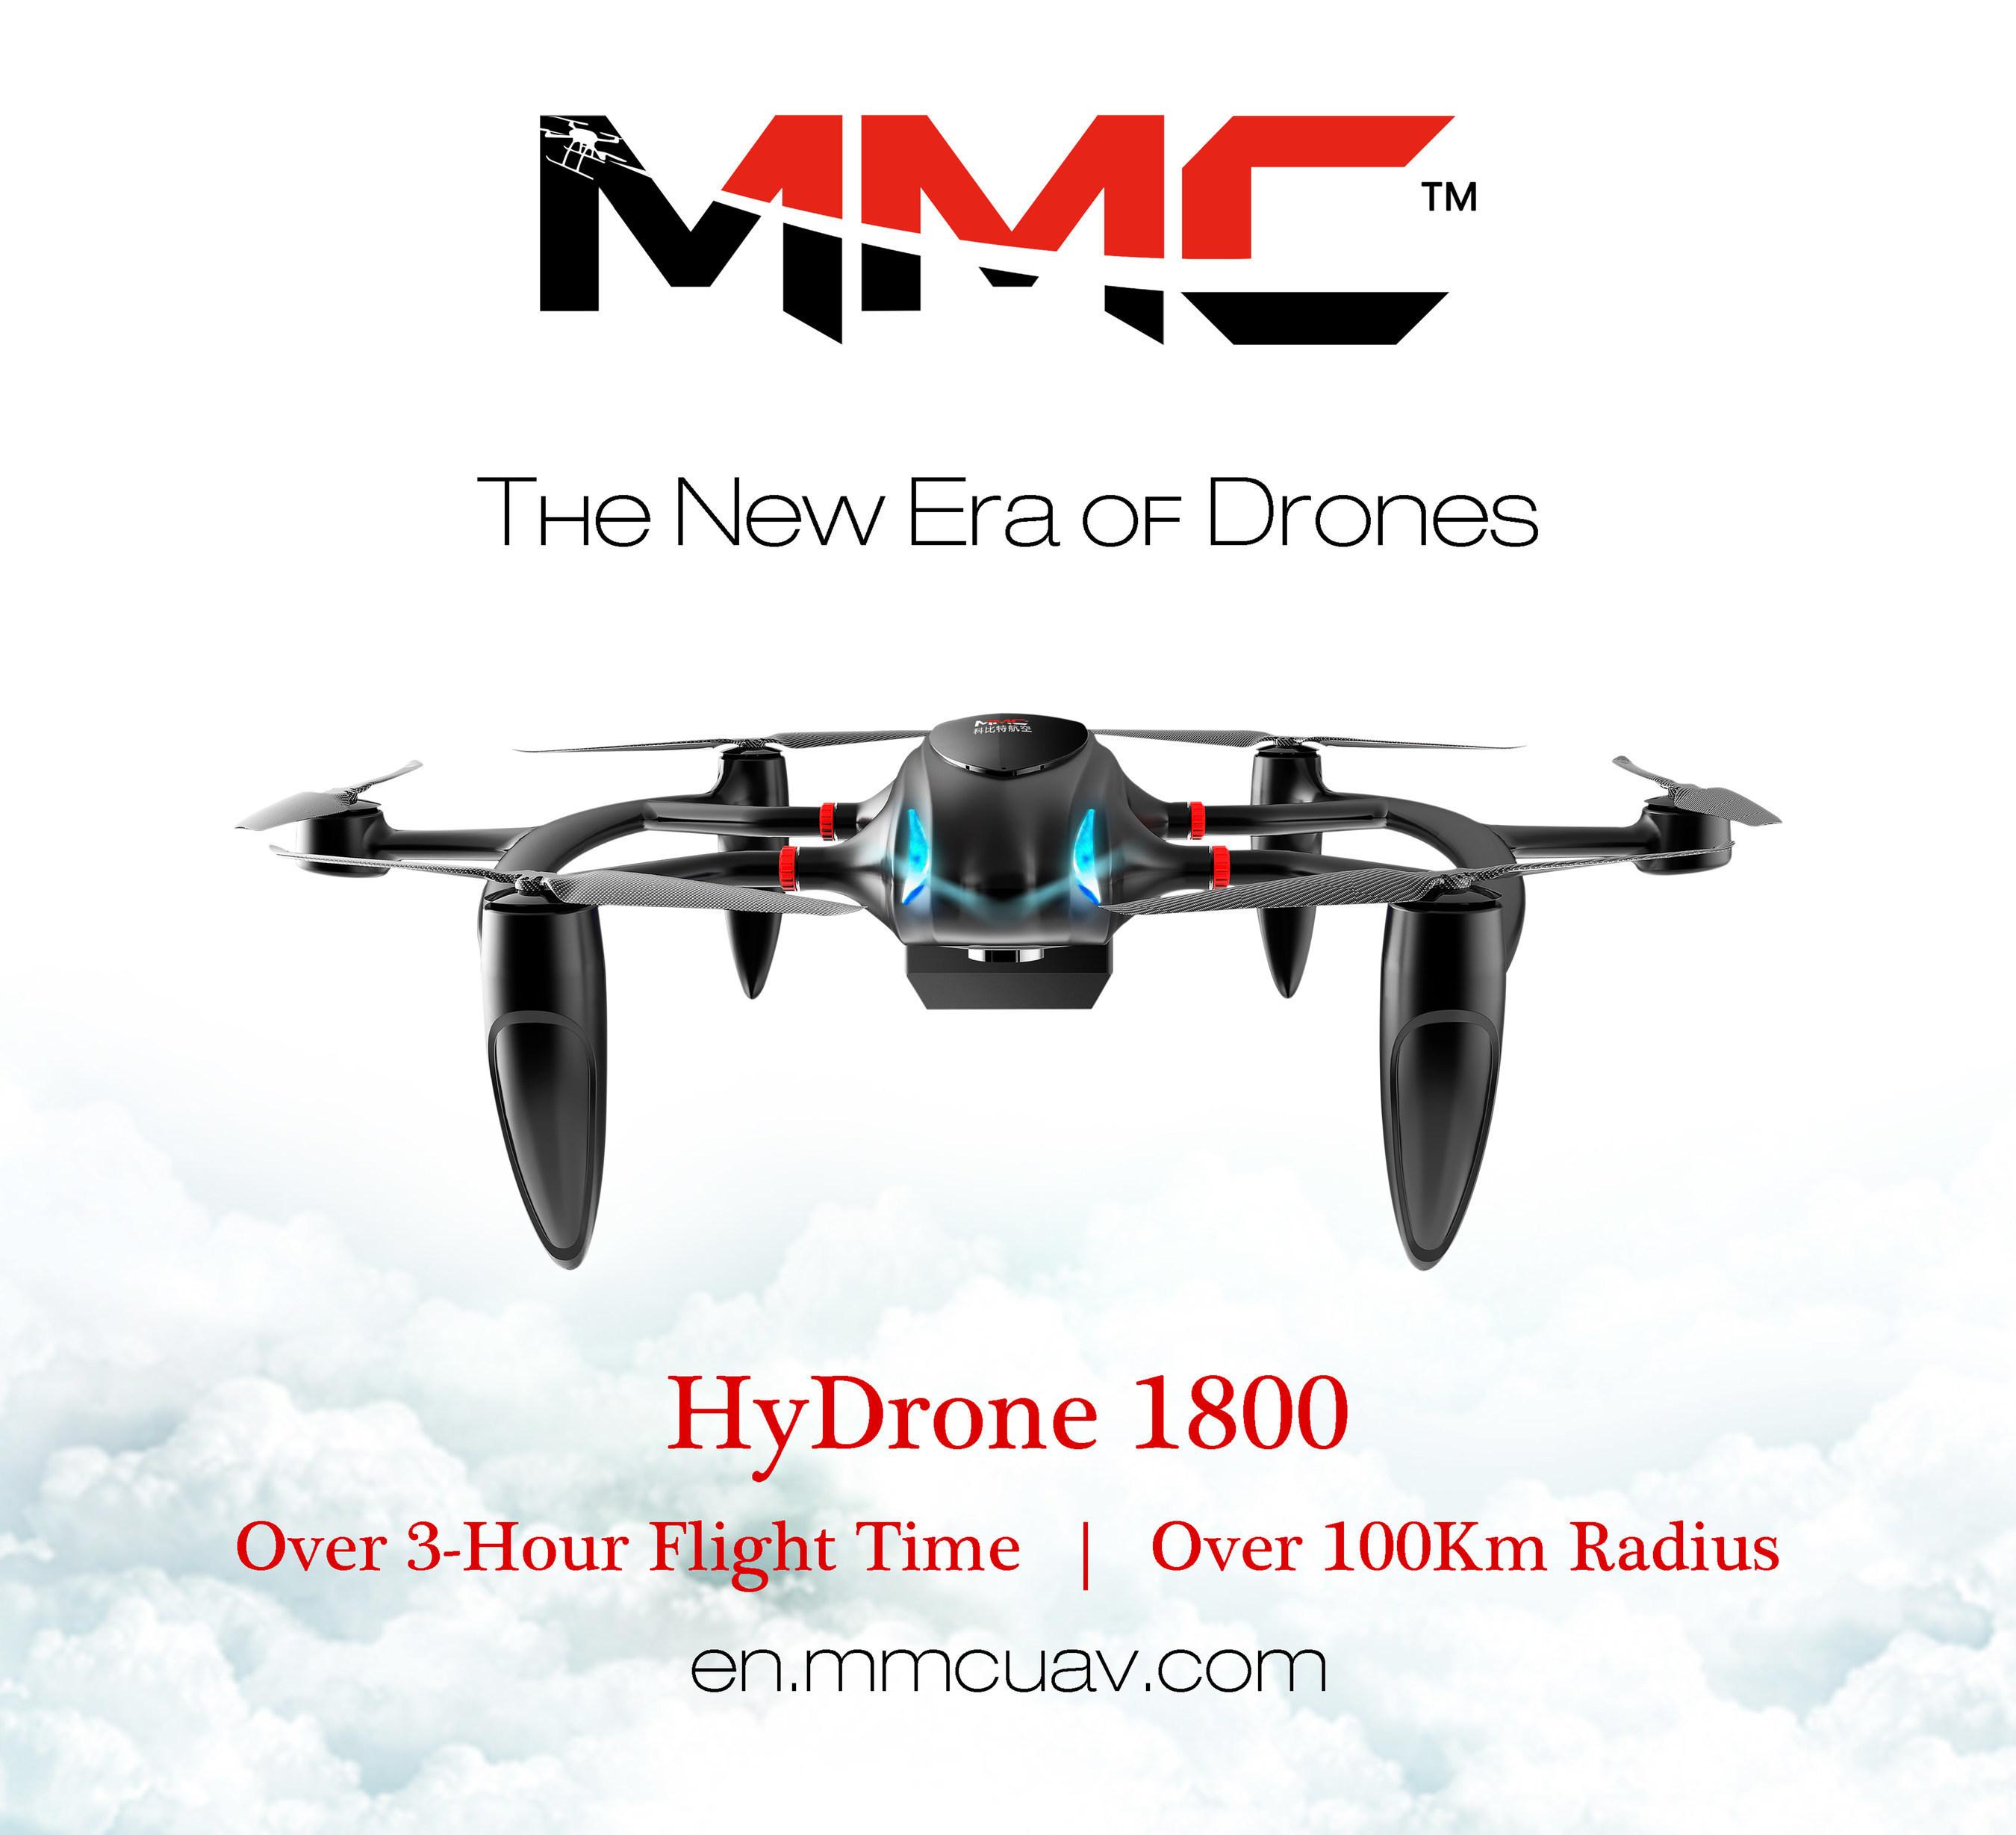 HyDrone 1800 by MMC